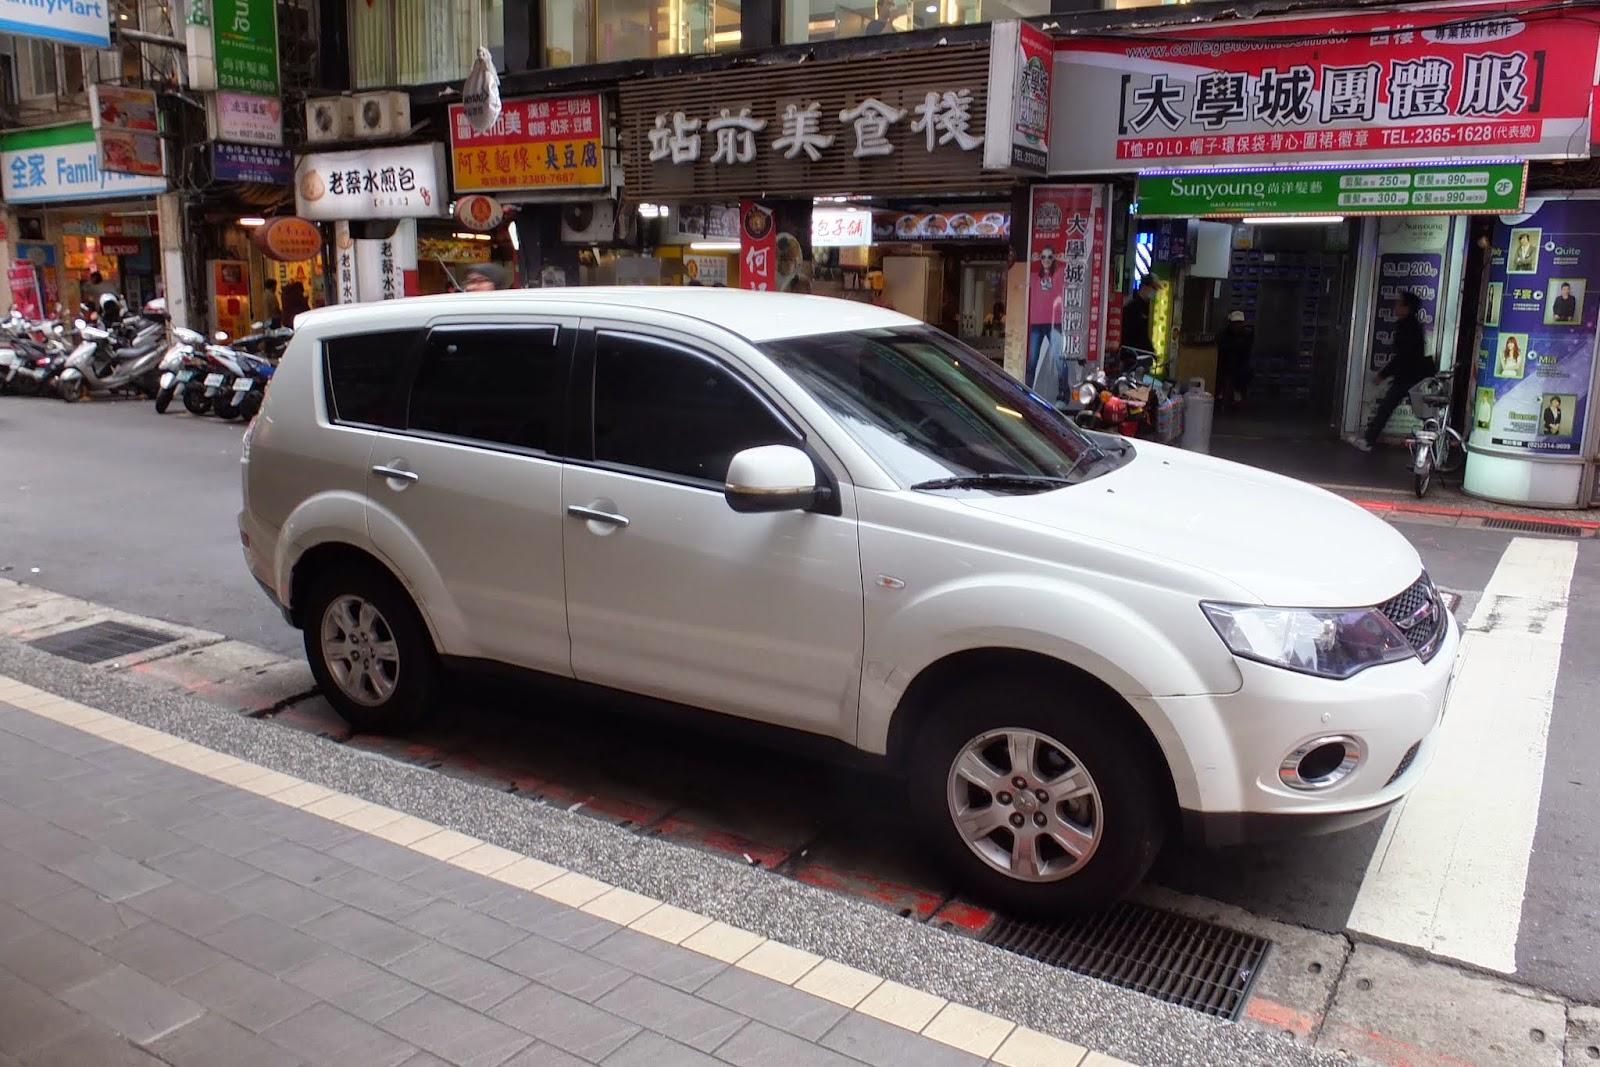 Taiwan-outlander 台湾アウトランダー(後期型)